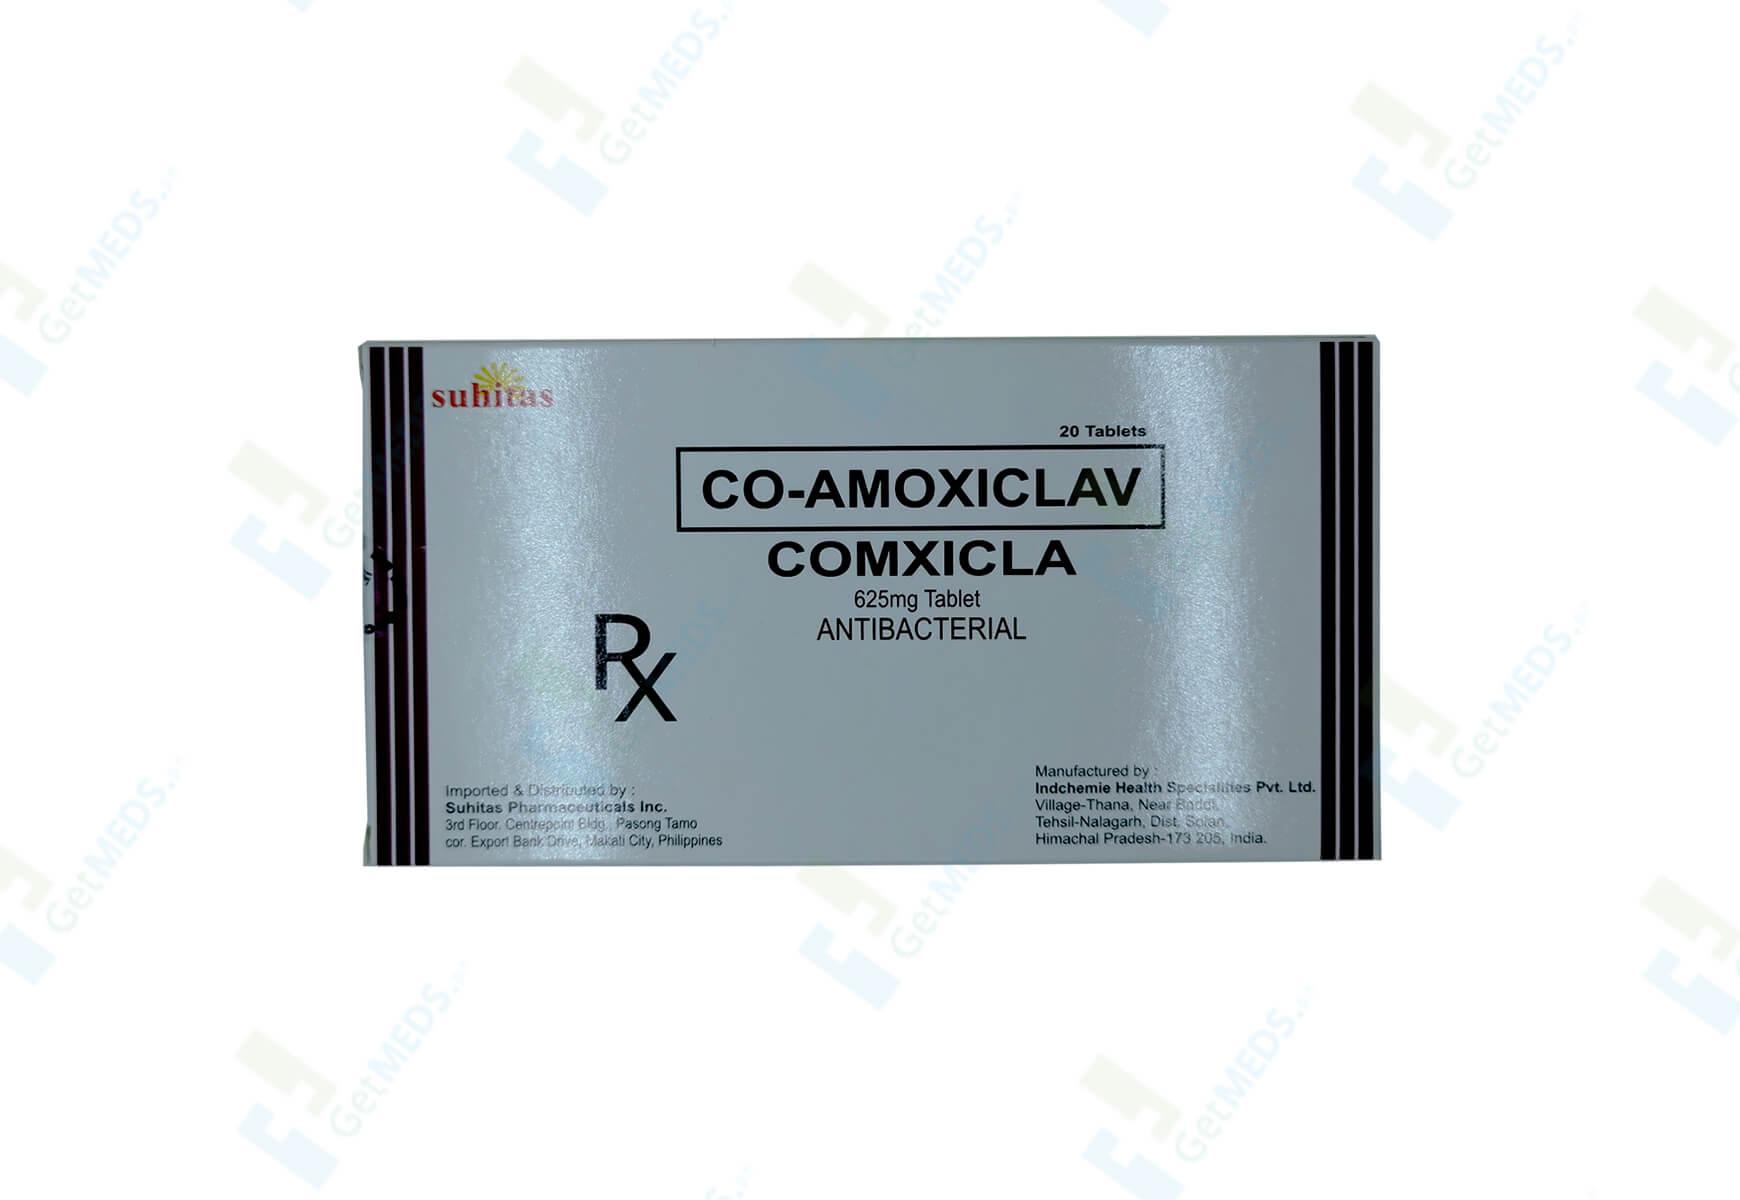 Comxicla